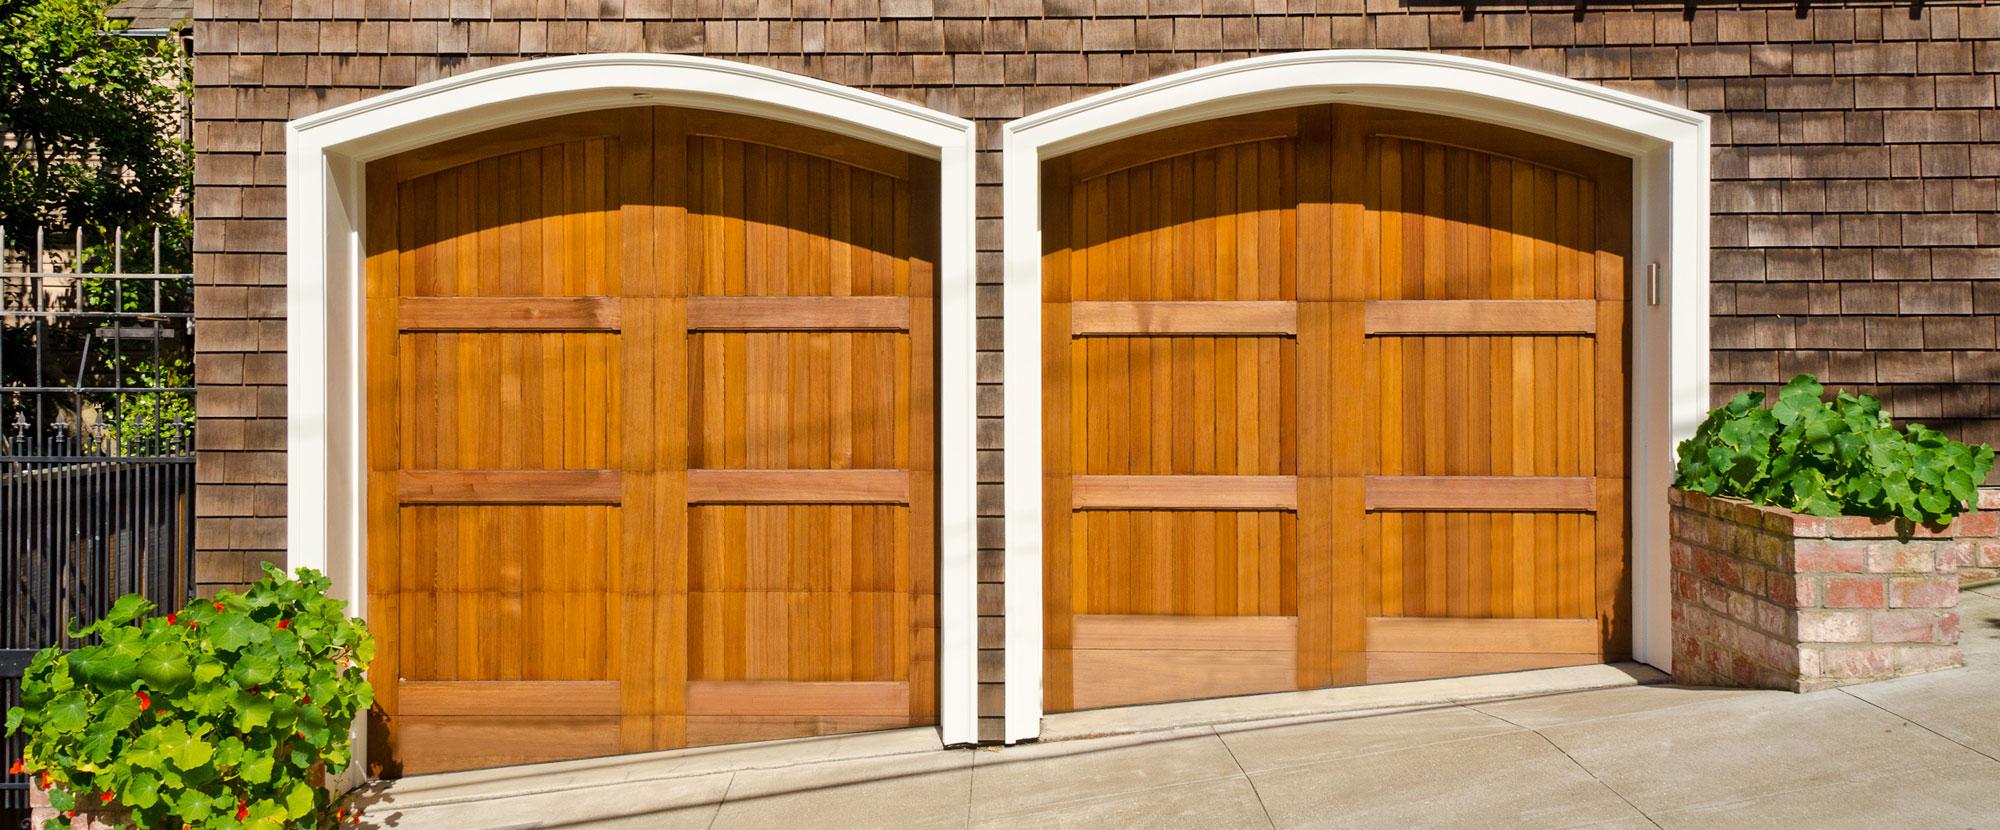 Garage doors midlothian orland park chicago il qdt for Garage door repair orland park il